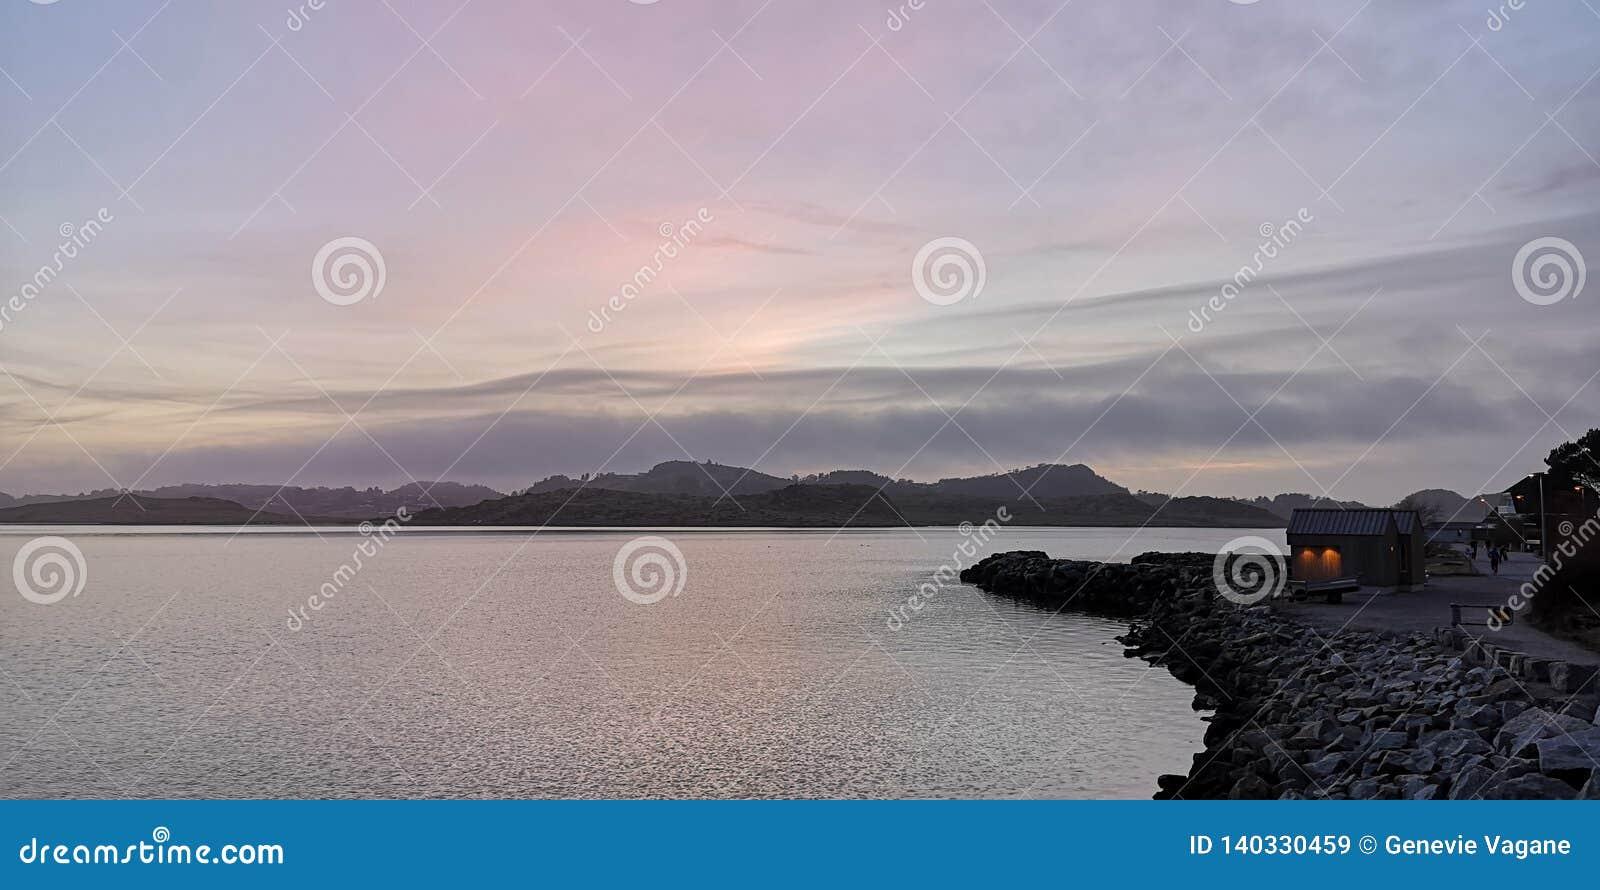 Hafrsfjord